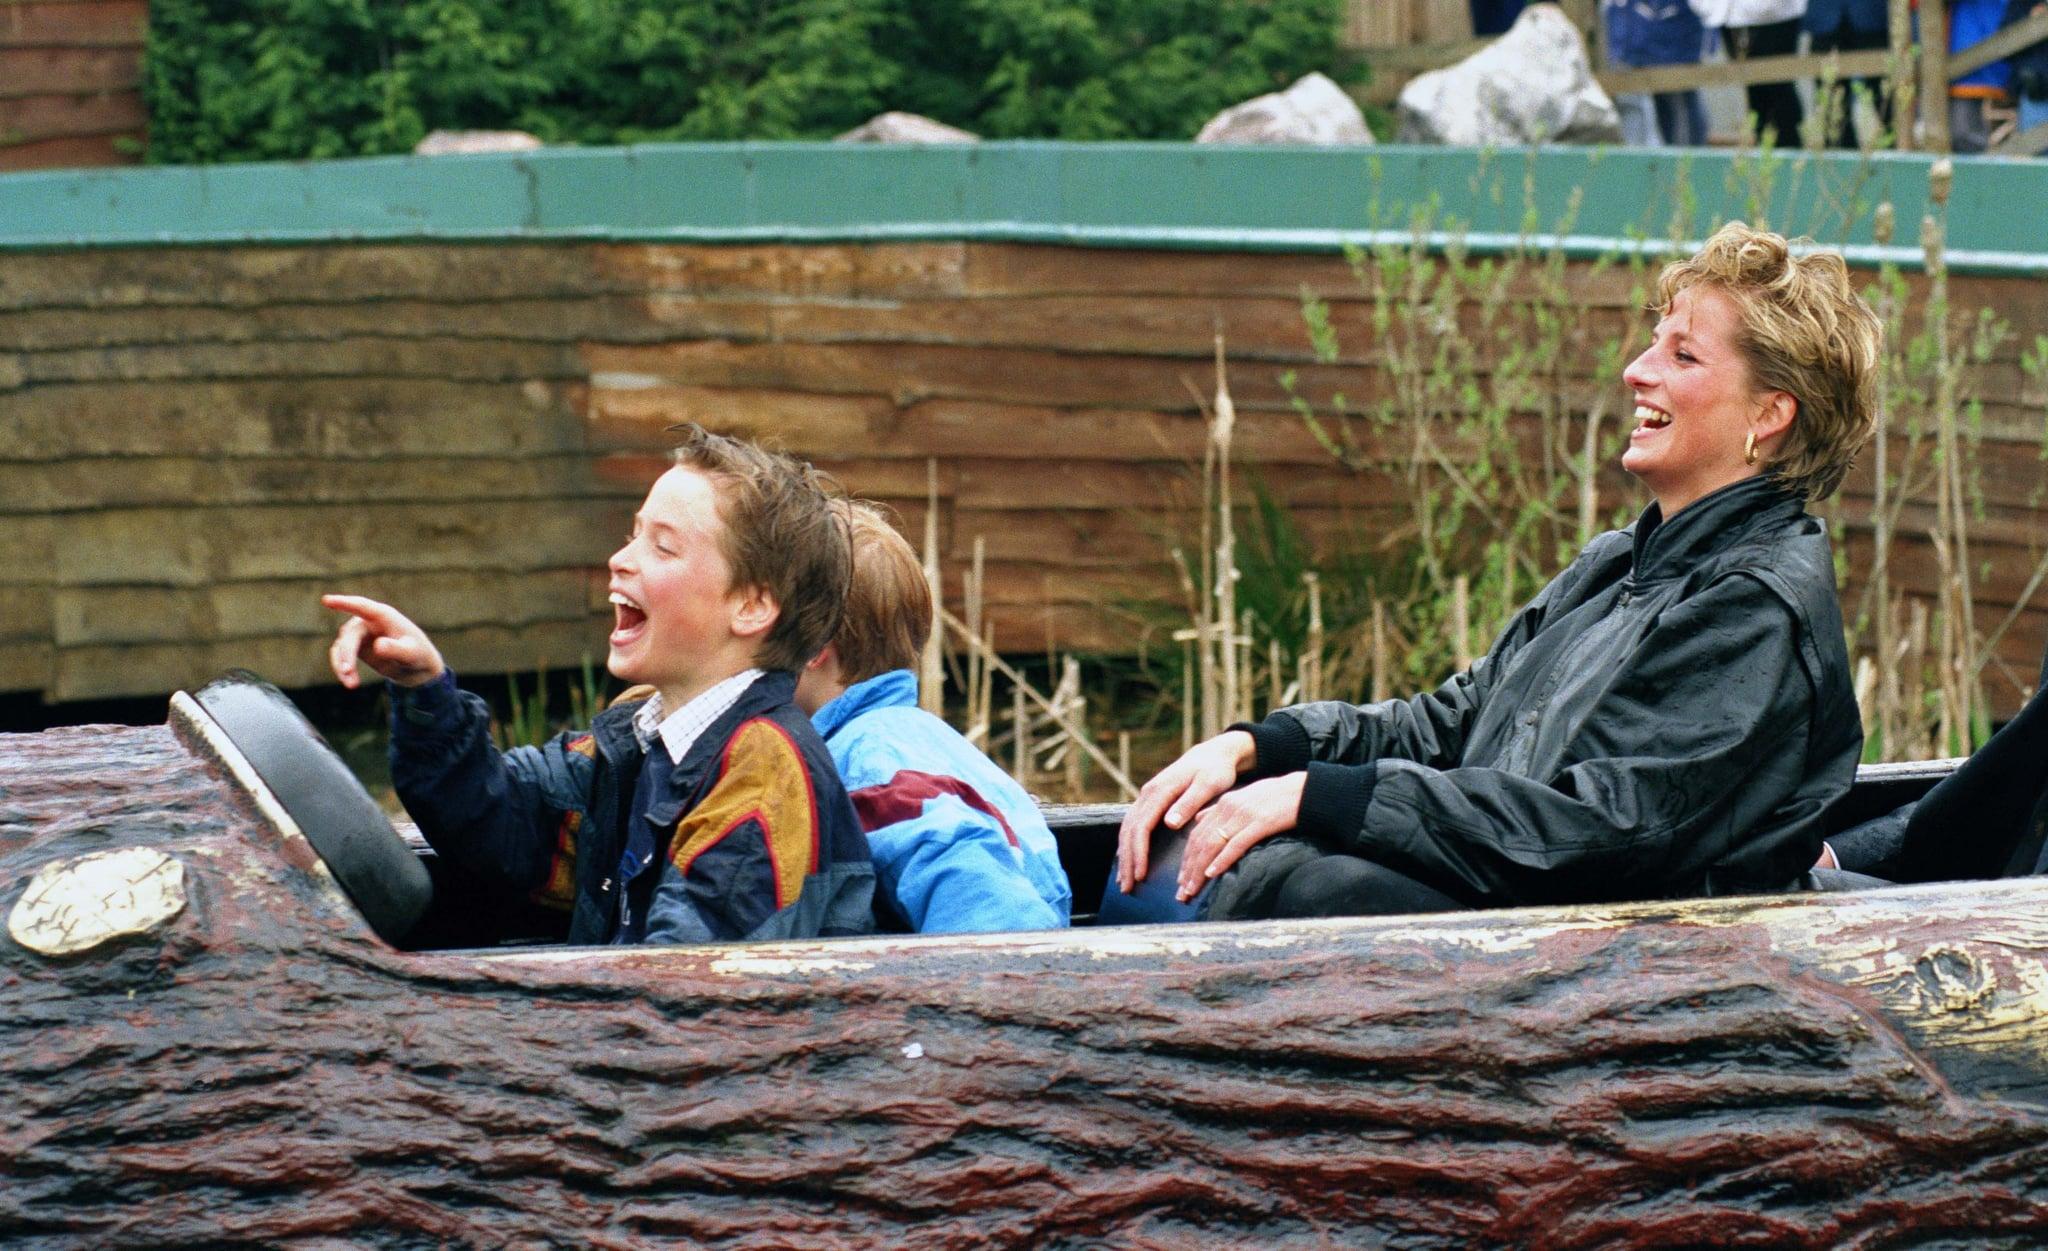 Diana Princess Of Wales, Prince William & Prince Harry Visit The 'Thorpe Park' Amusement Park. (Photo by Antony Jones/UK Press via Getty Images)